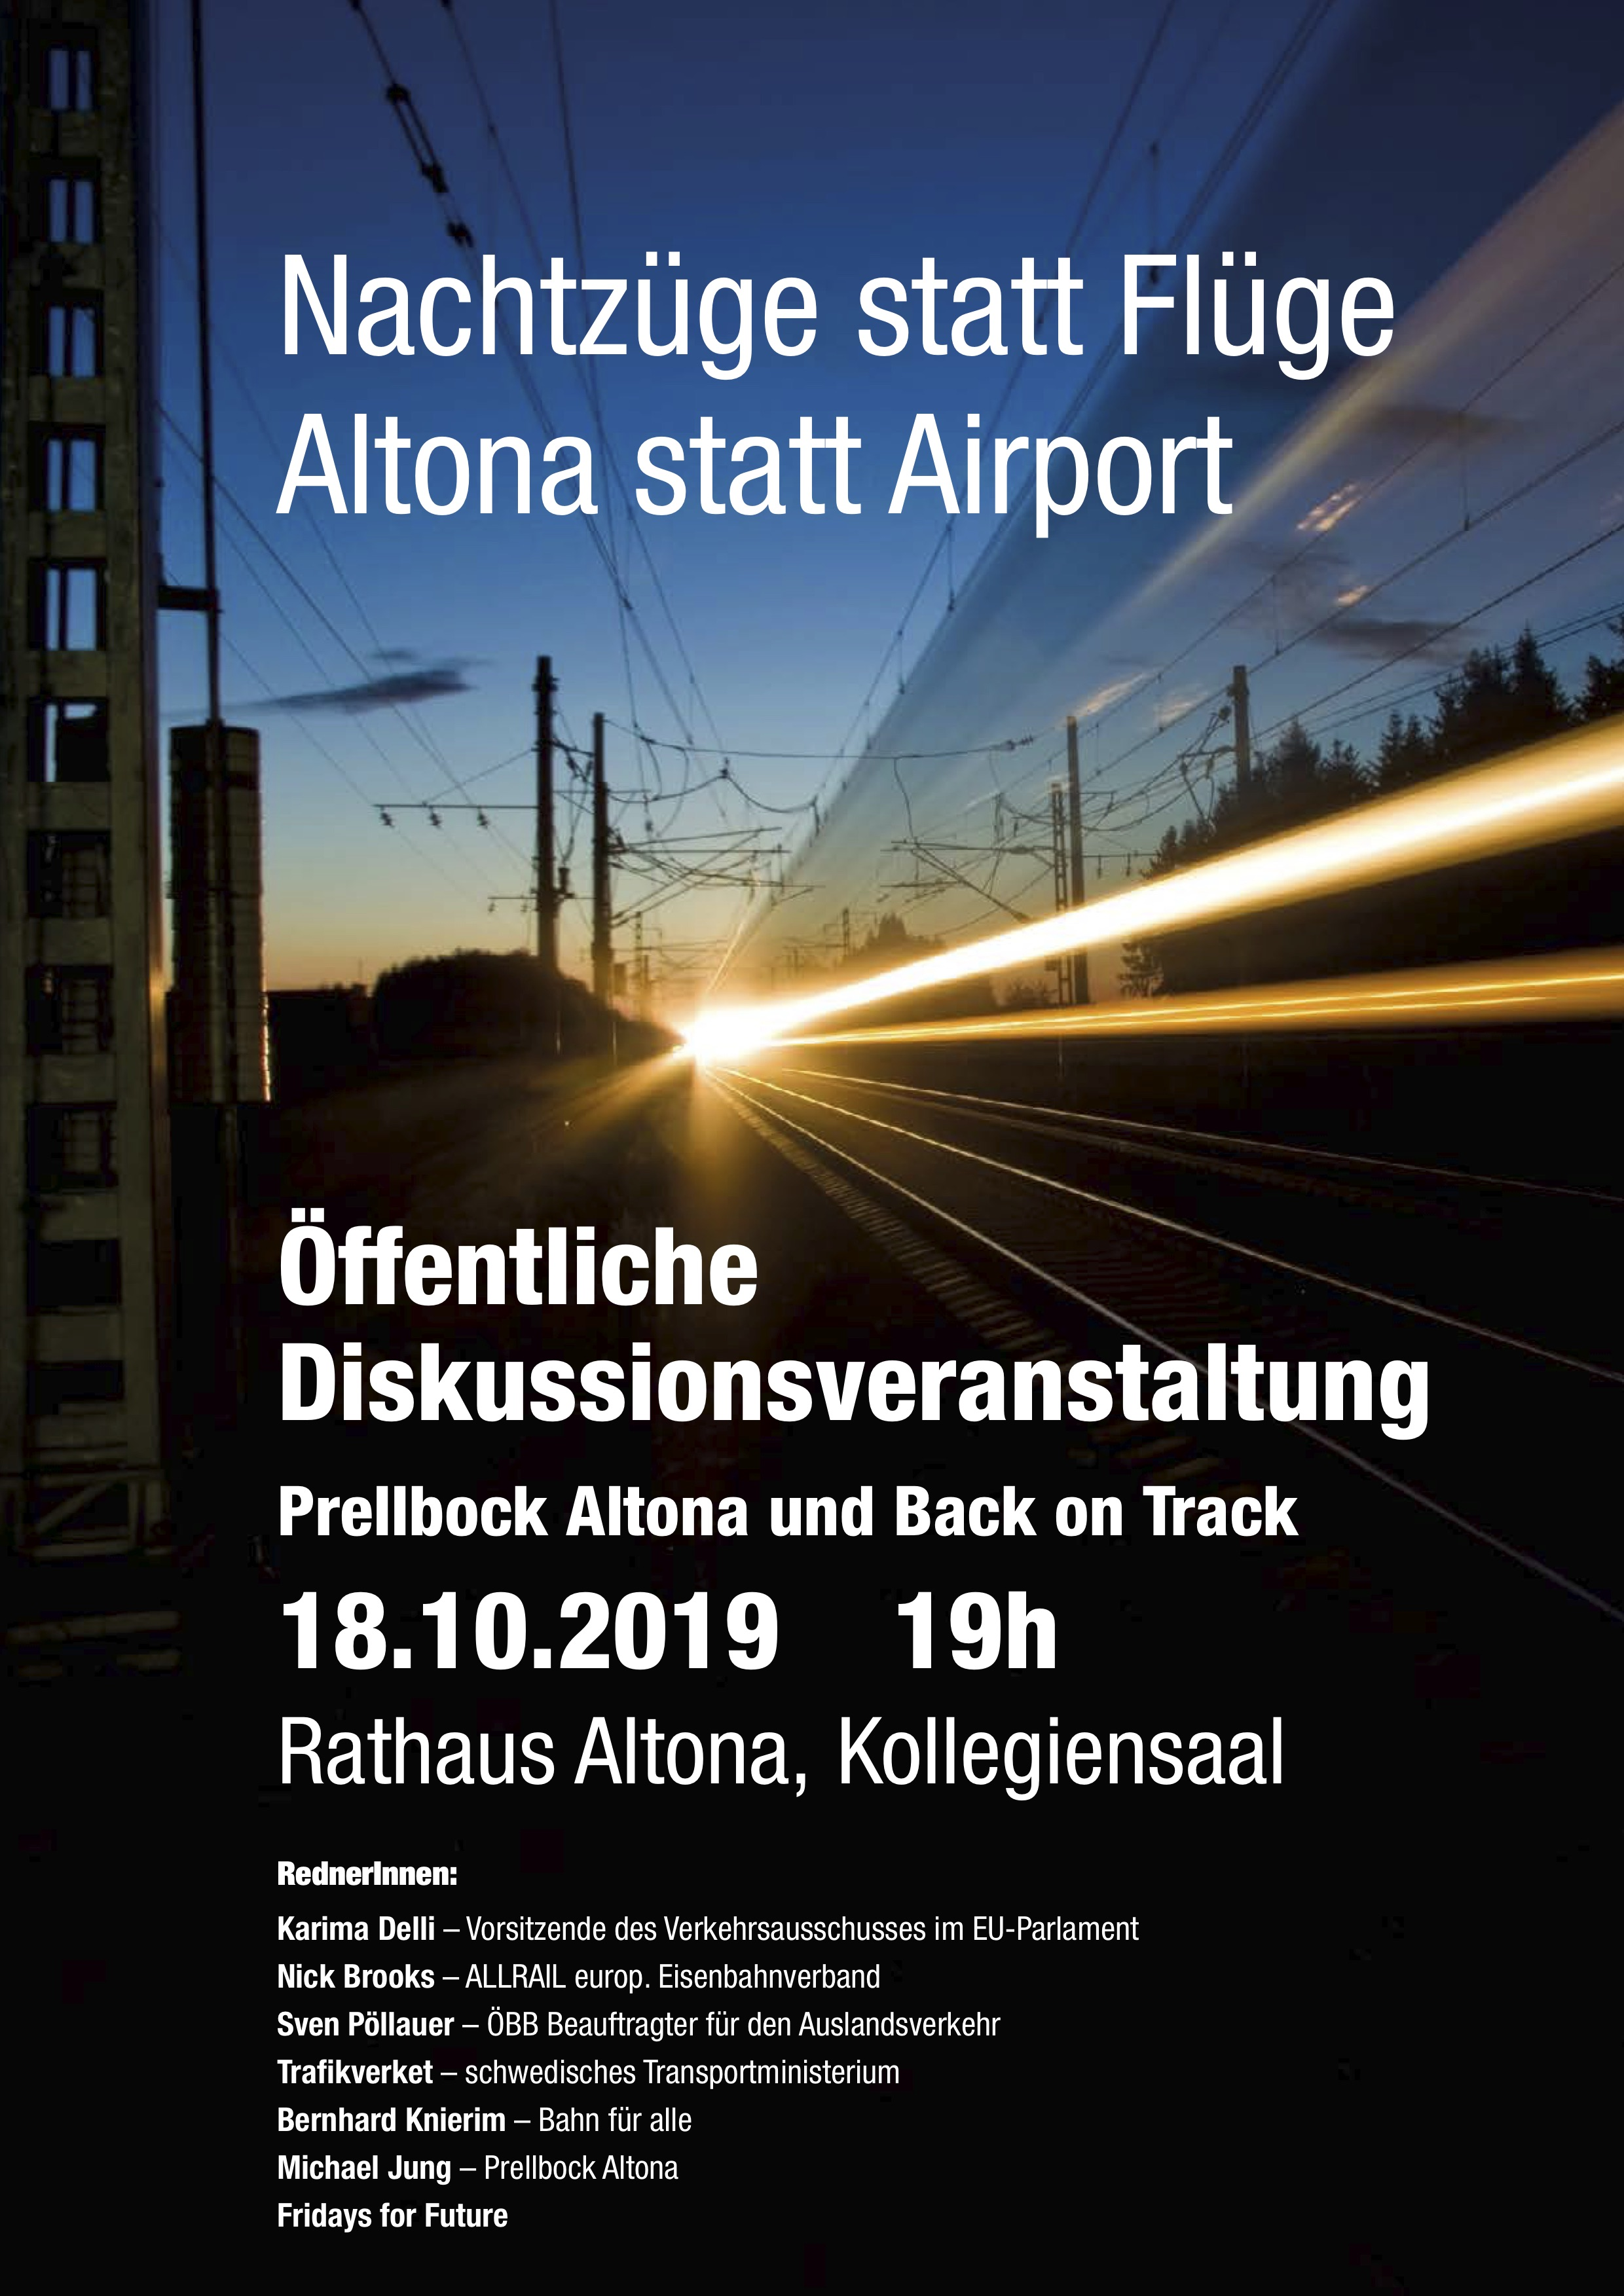 Nachtzug-Konferenz in Hamburg-Altona